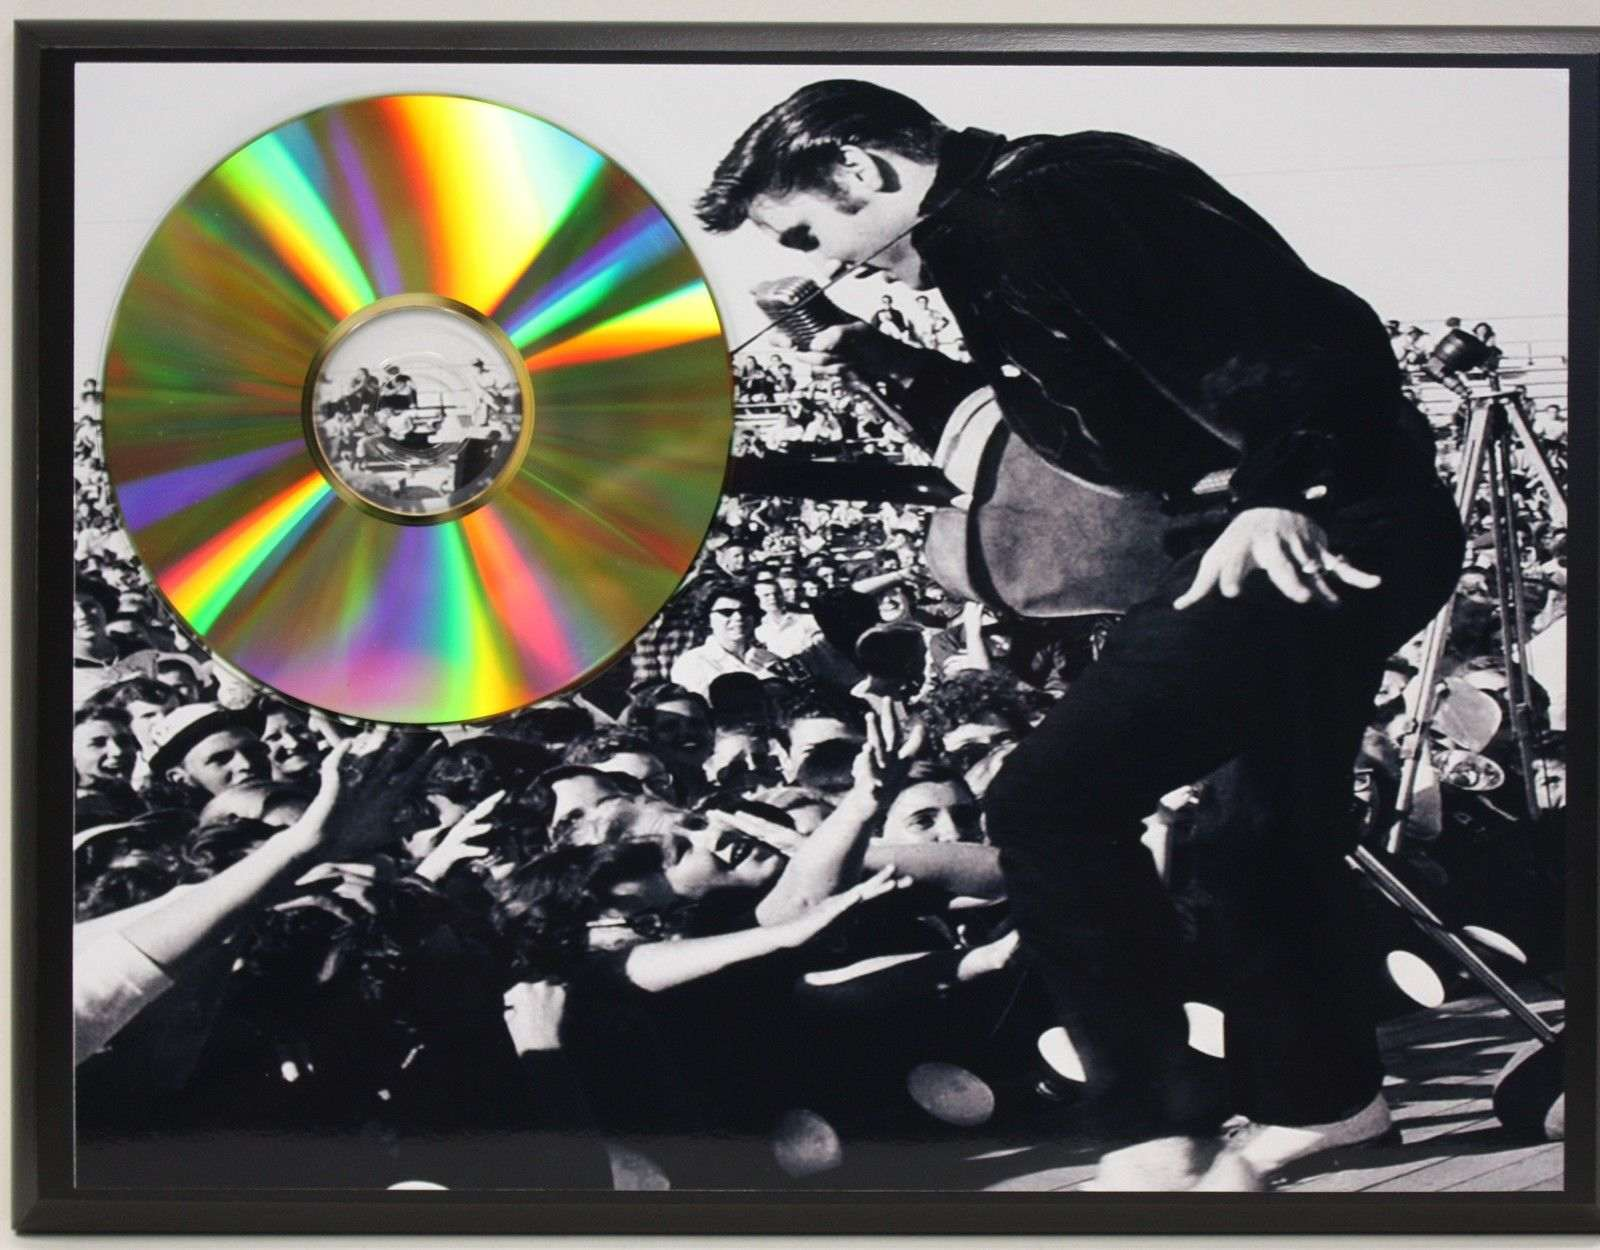 elvis presley 24 kt ltd edition gold cd plaque free u s priority shipping gold record awards. Black Bedroom Furniture Sets. Home Design Ideas